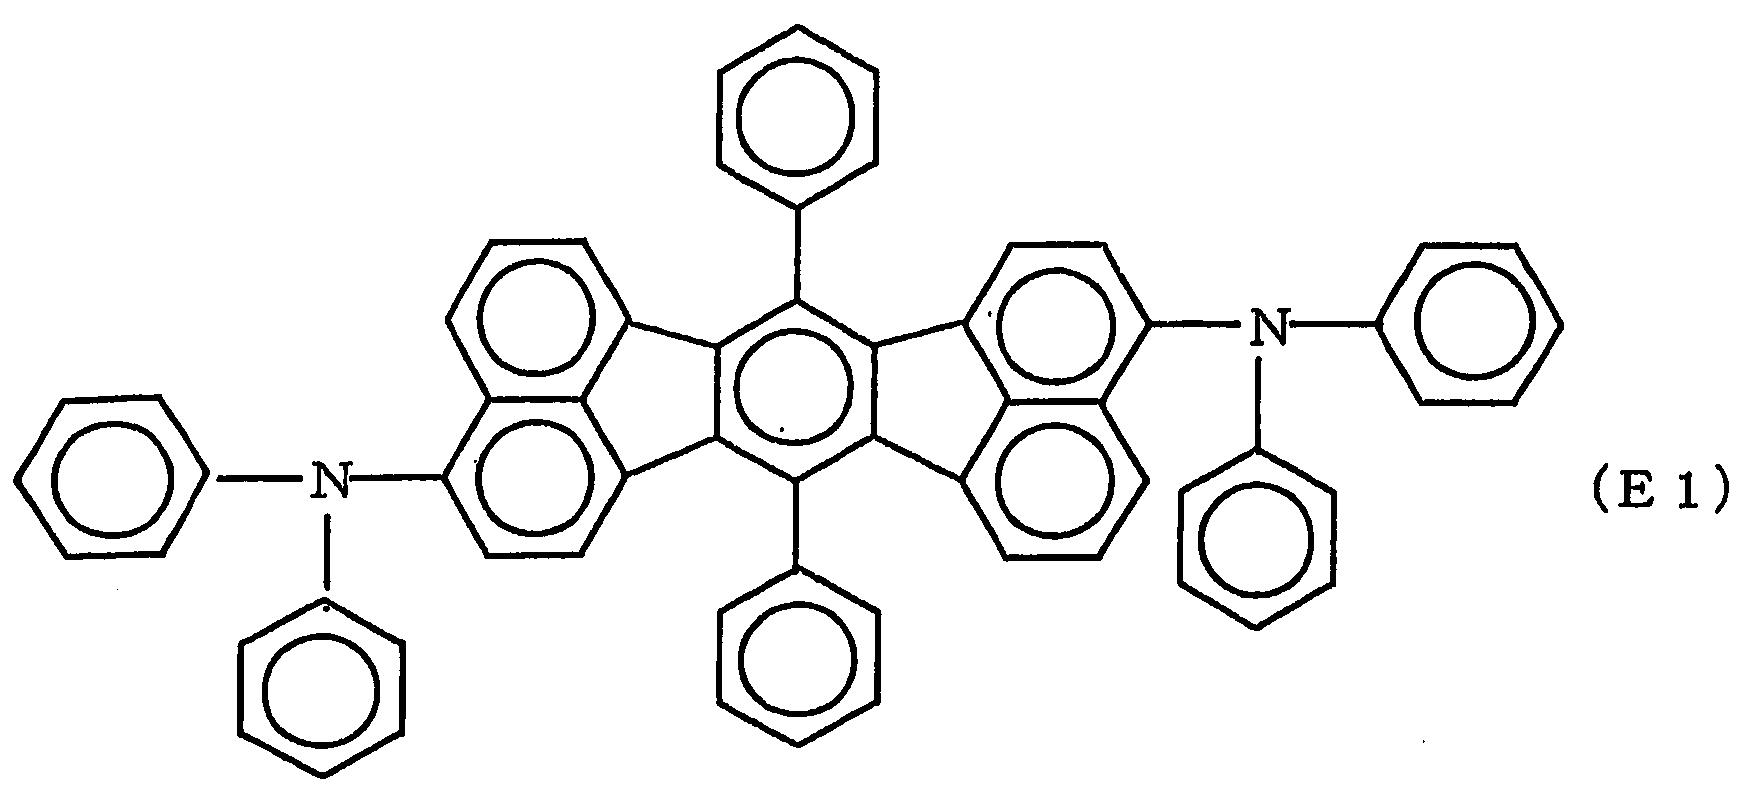 Figure 112001021532154-pct00052